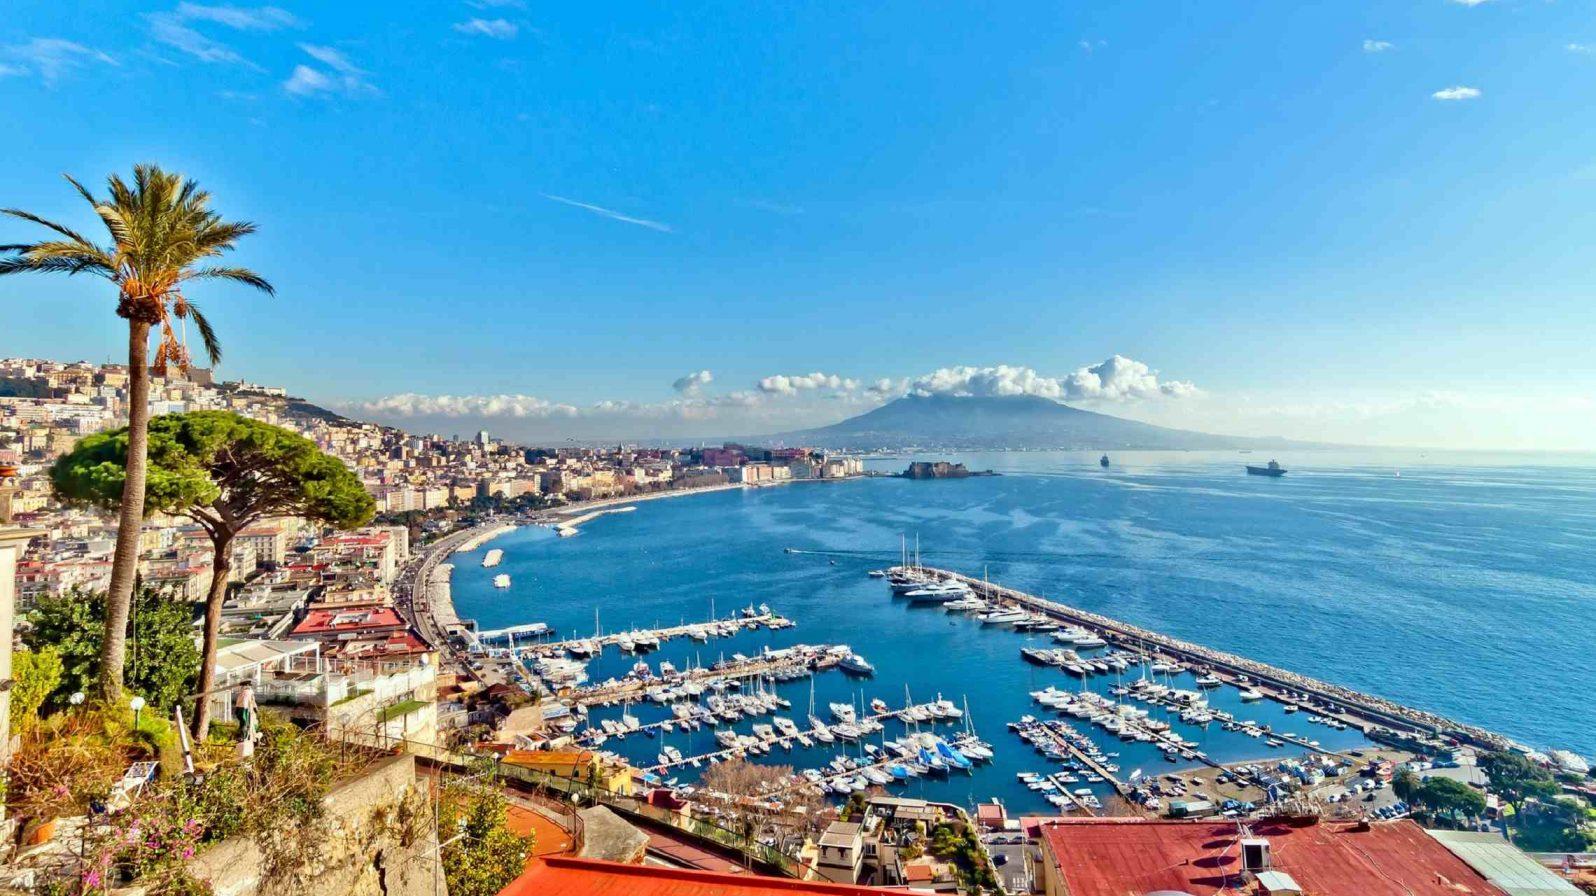 Napolin-lahti-Italia-1596x896.jpg